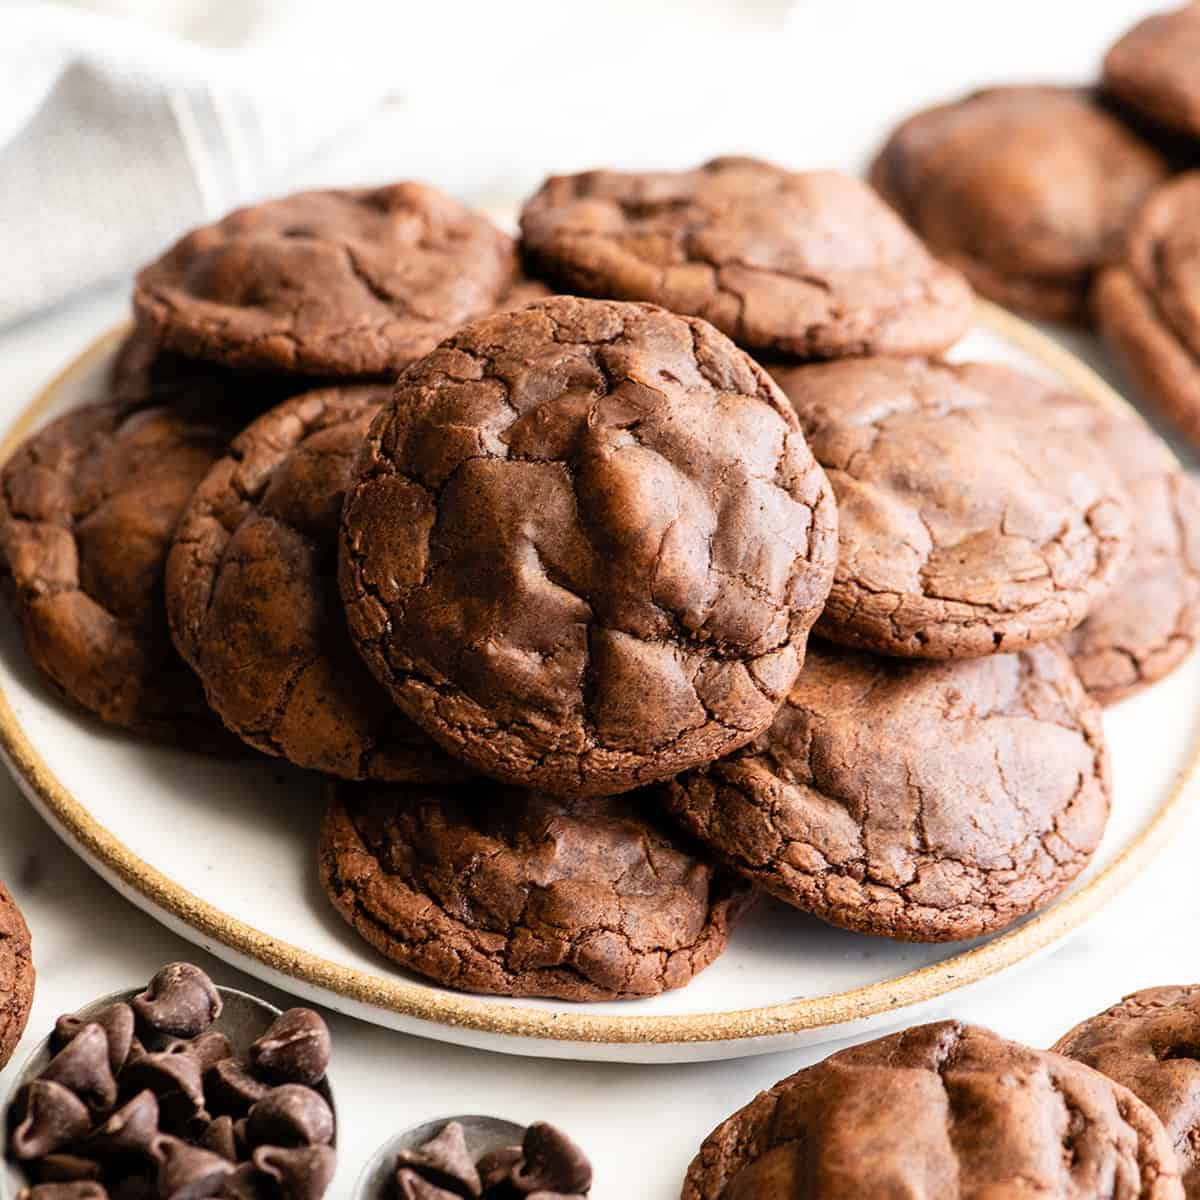 a plate of Chocolate Brownie Cookies